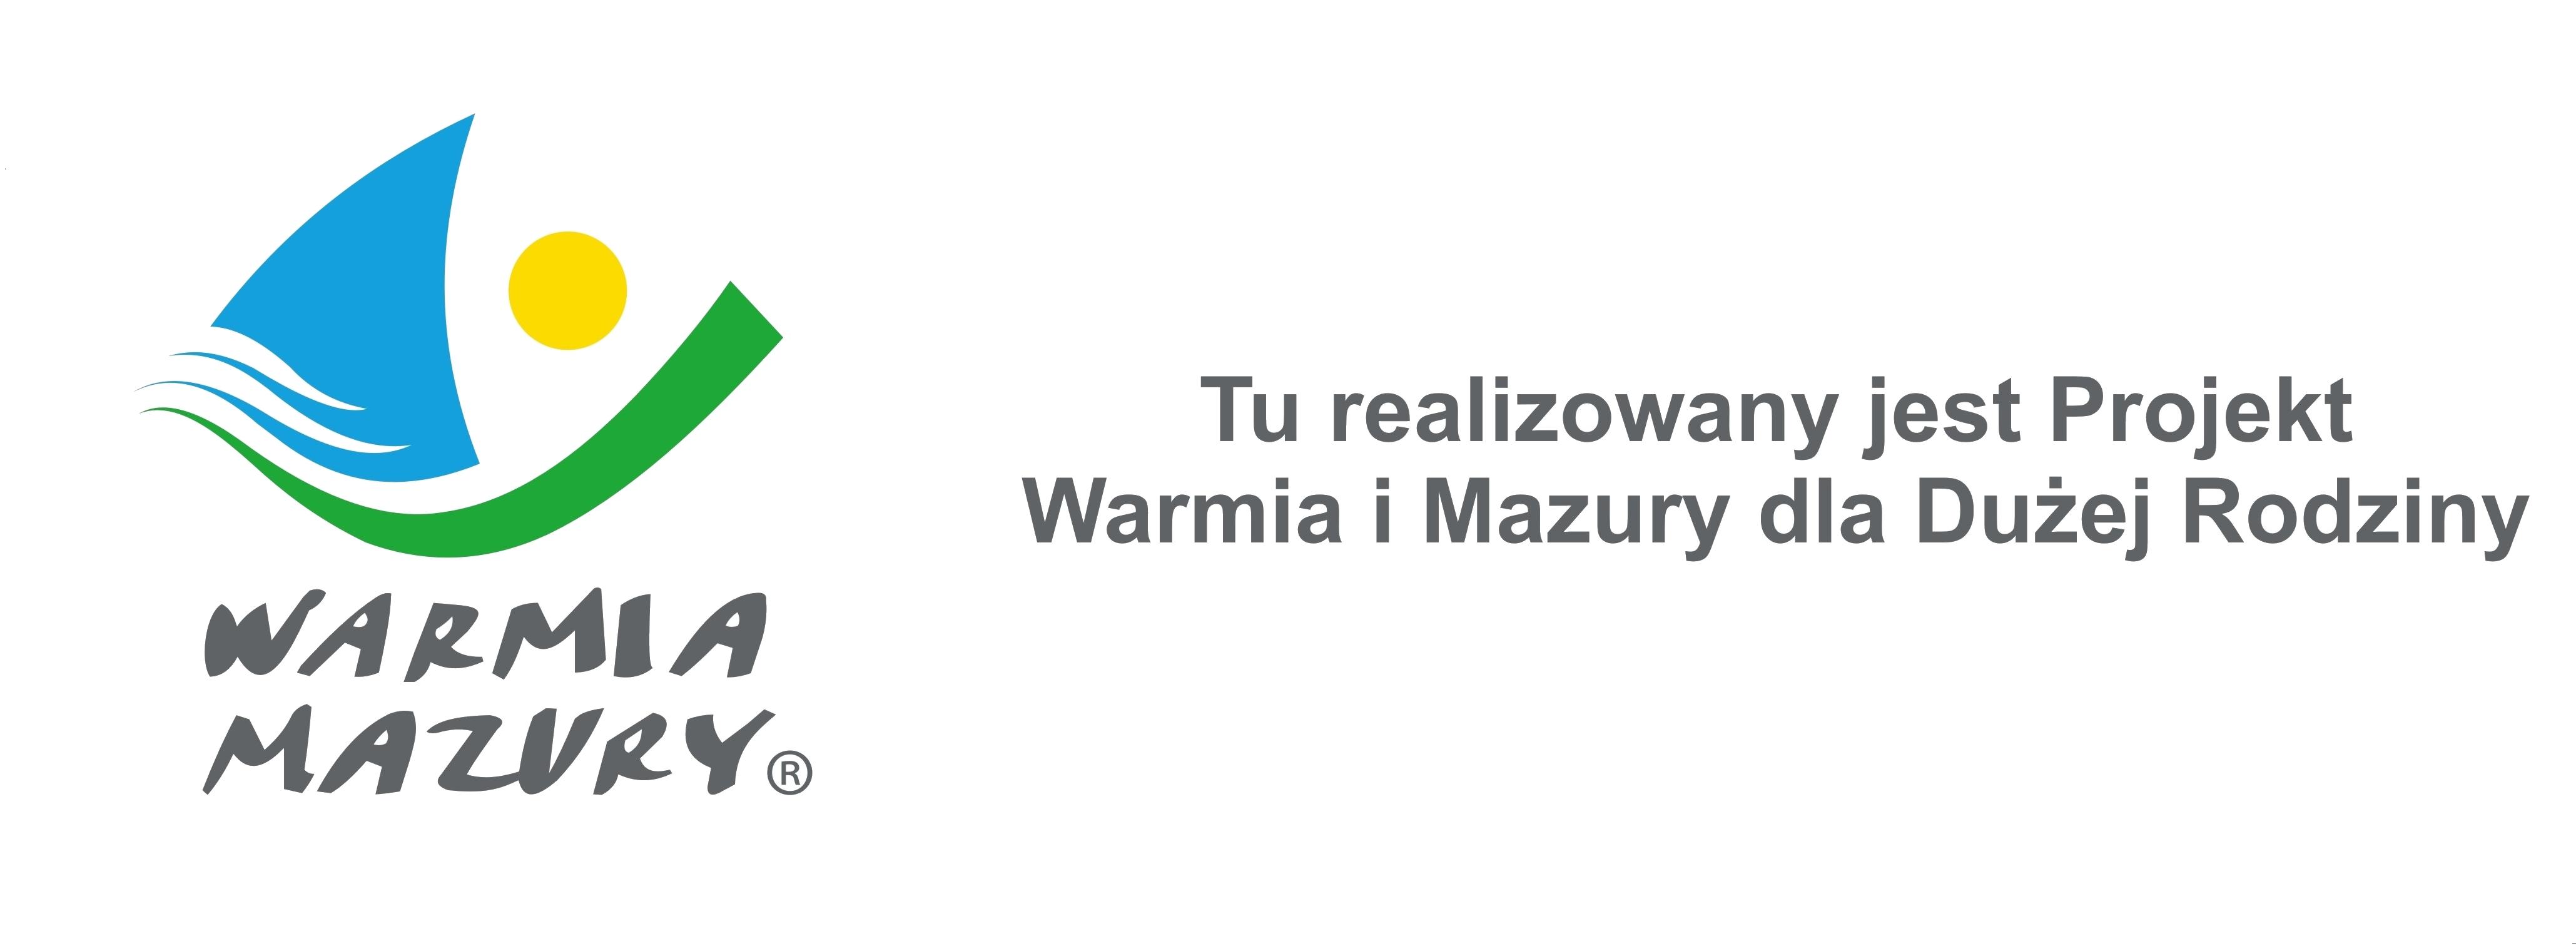 http://m.wmwm.pl/2015/07/orig/projekt-rodzina-4580.jpg